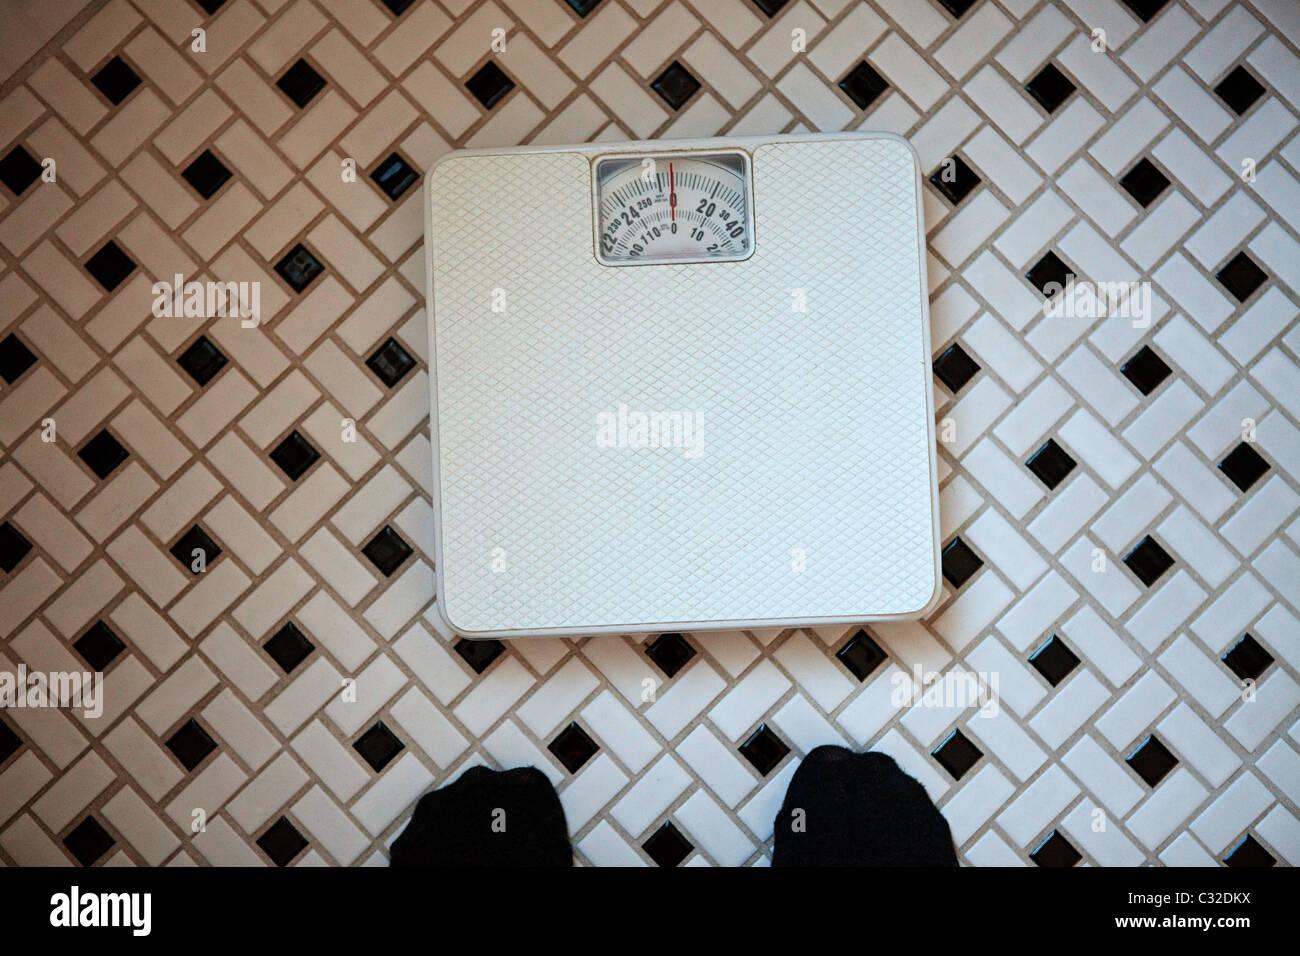 bathroom scales above stock photos bathroom scales above stock rh alamy com